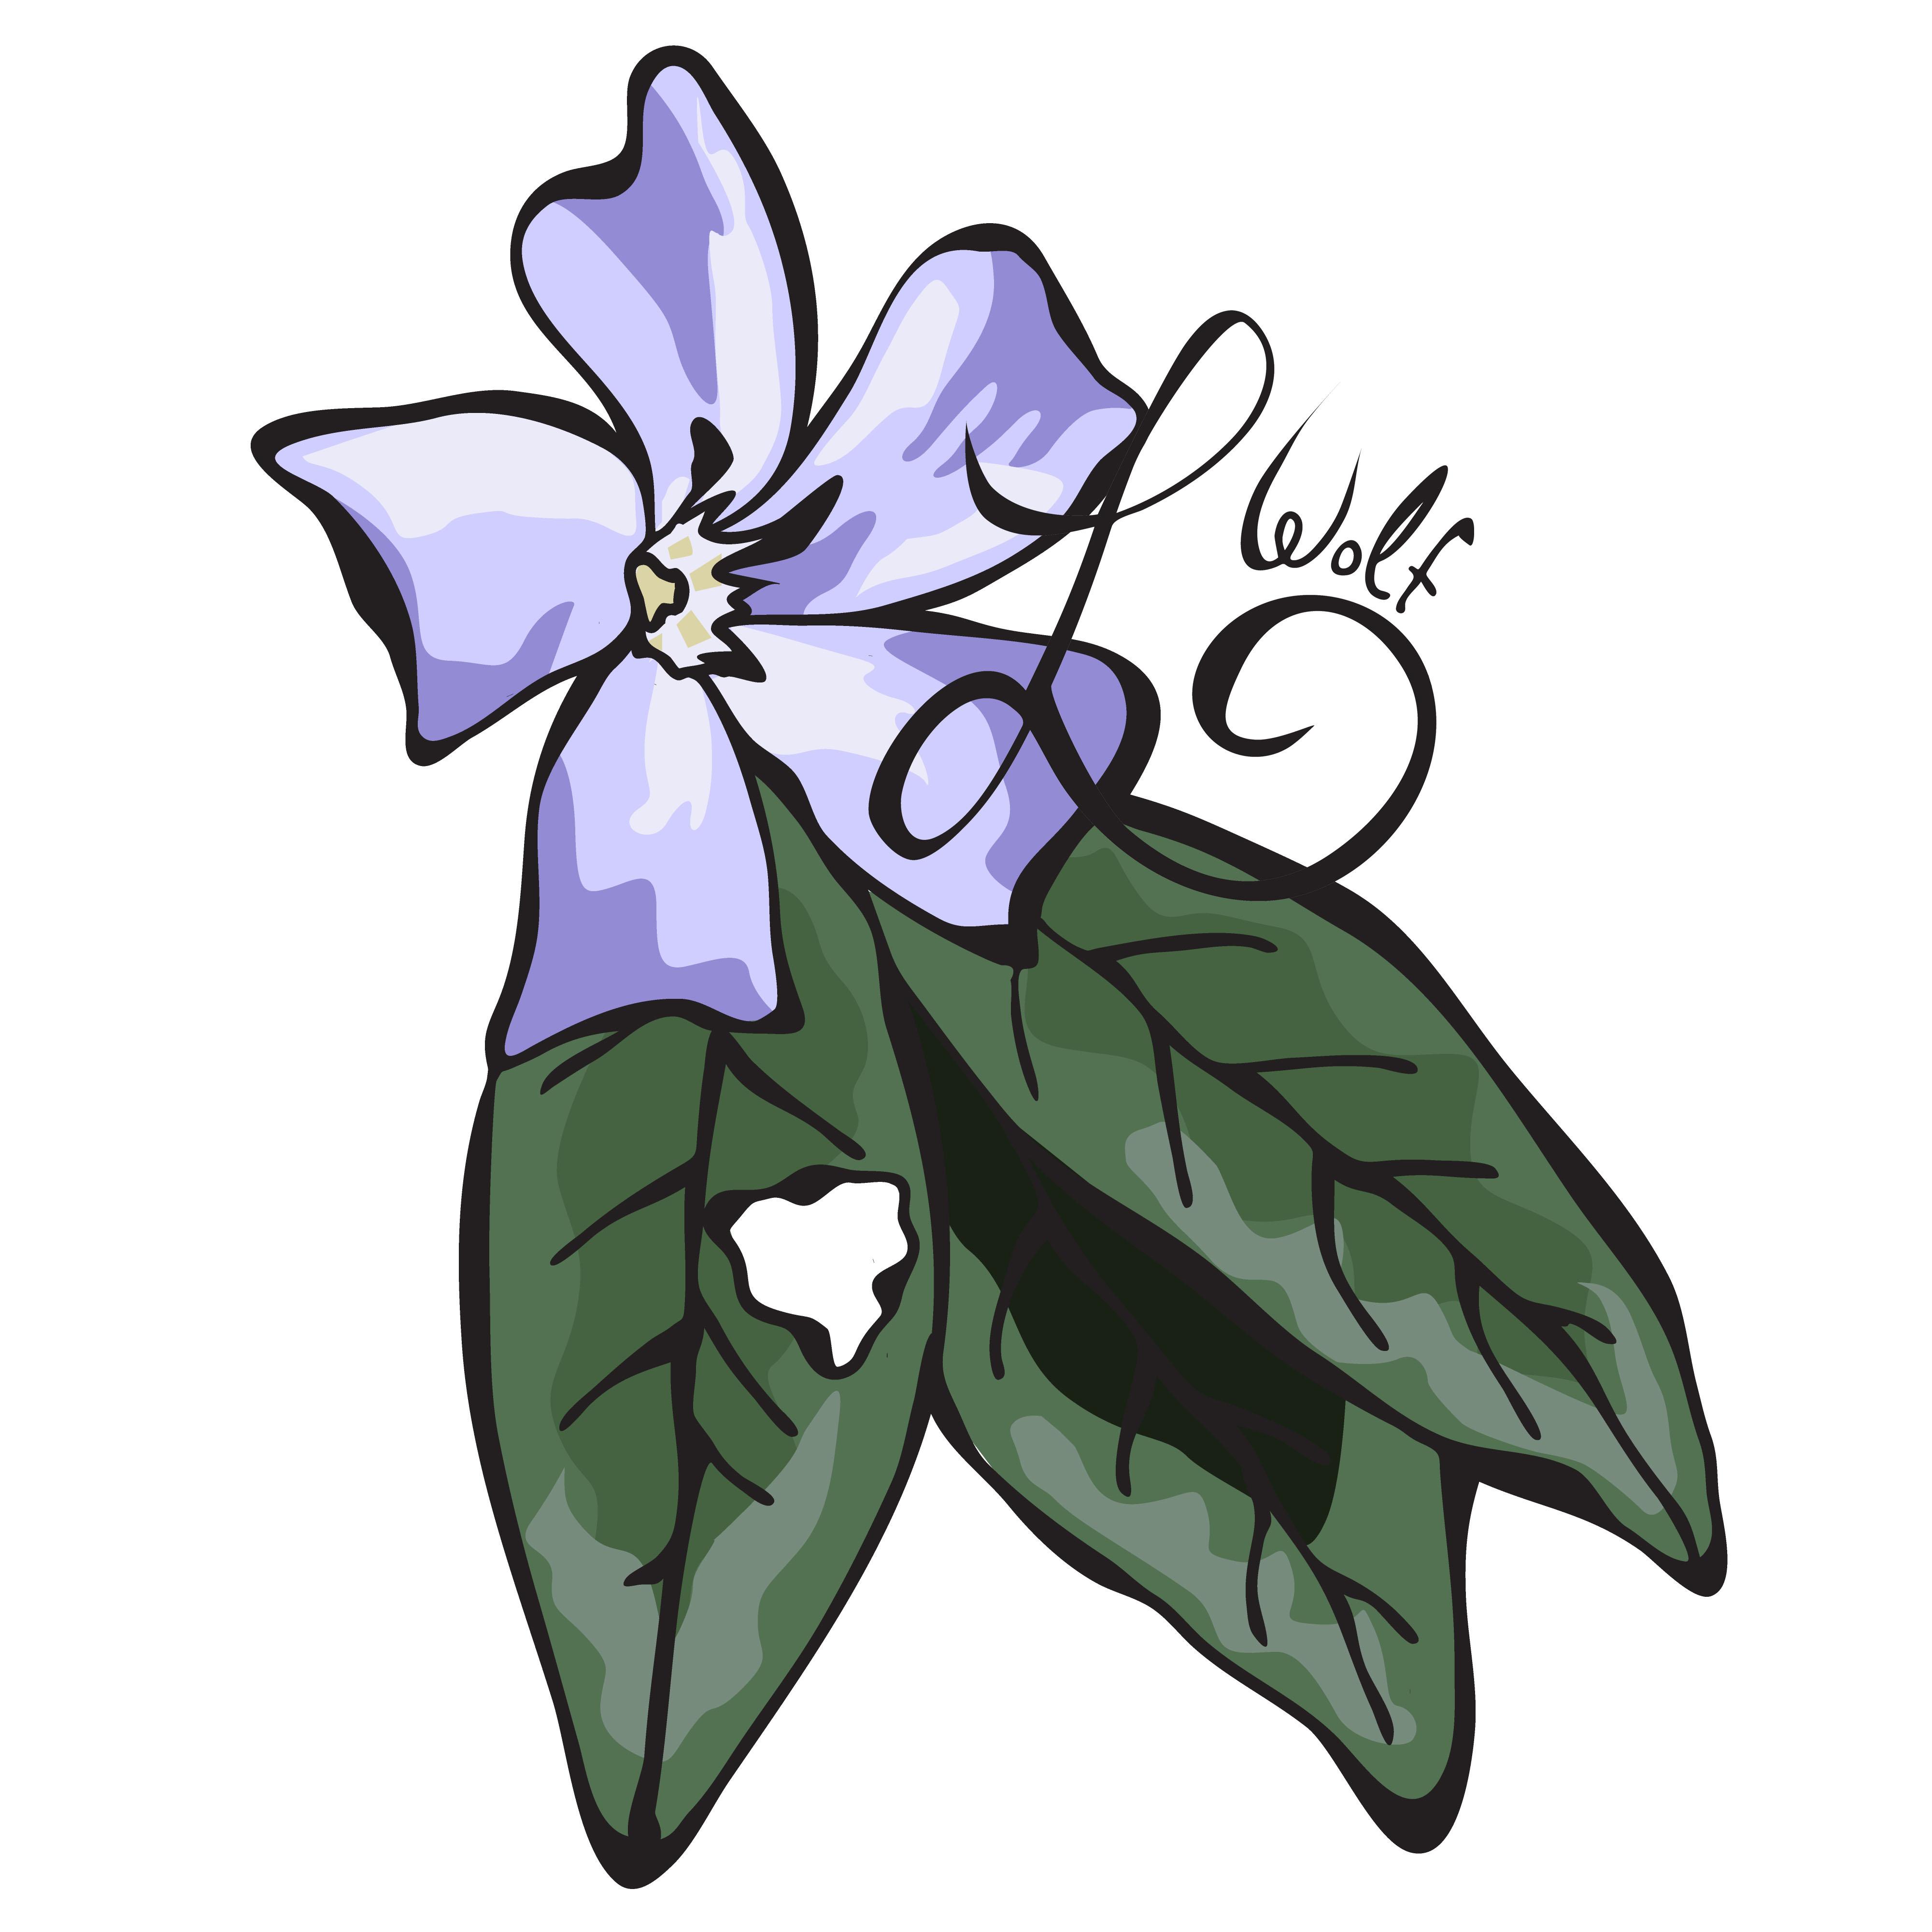 Vinca major flower by Lunas.